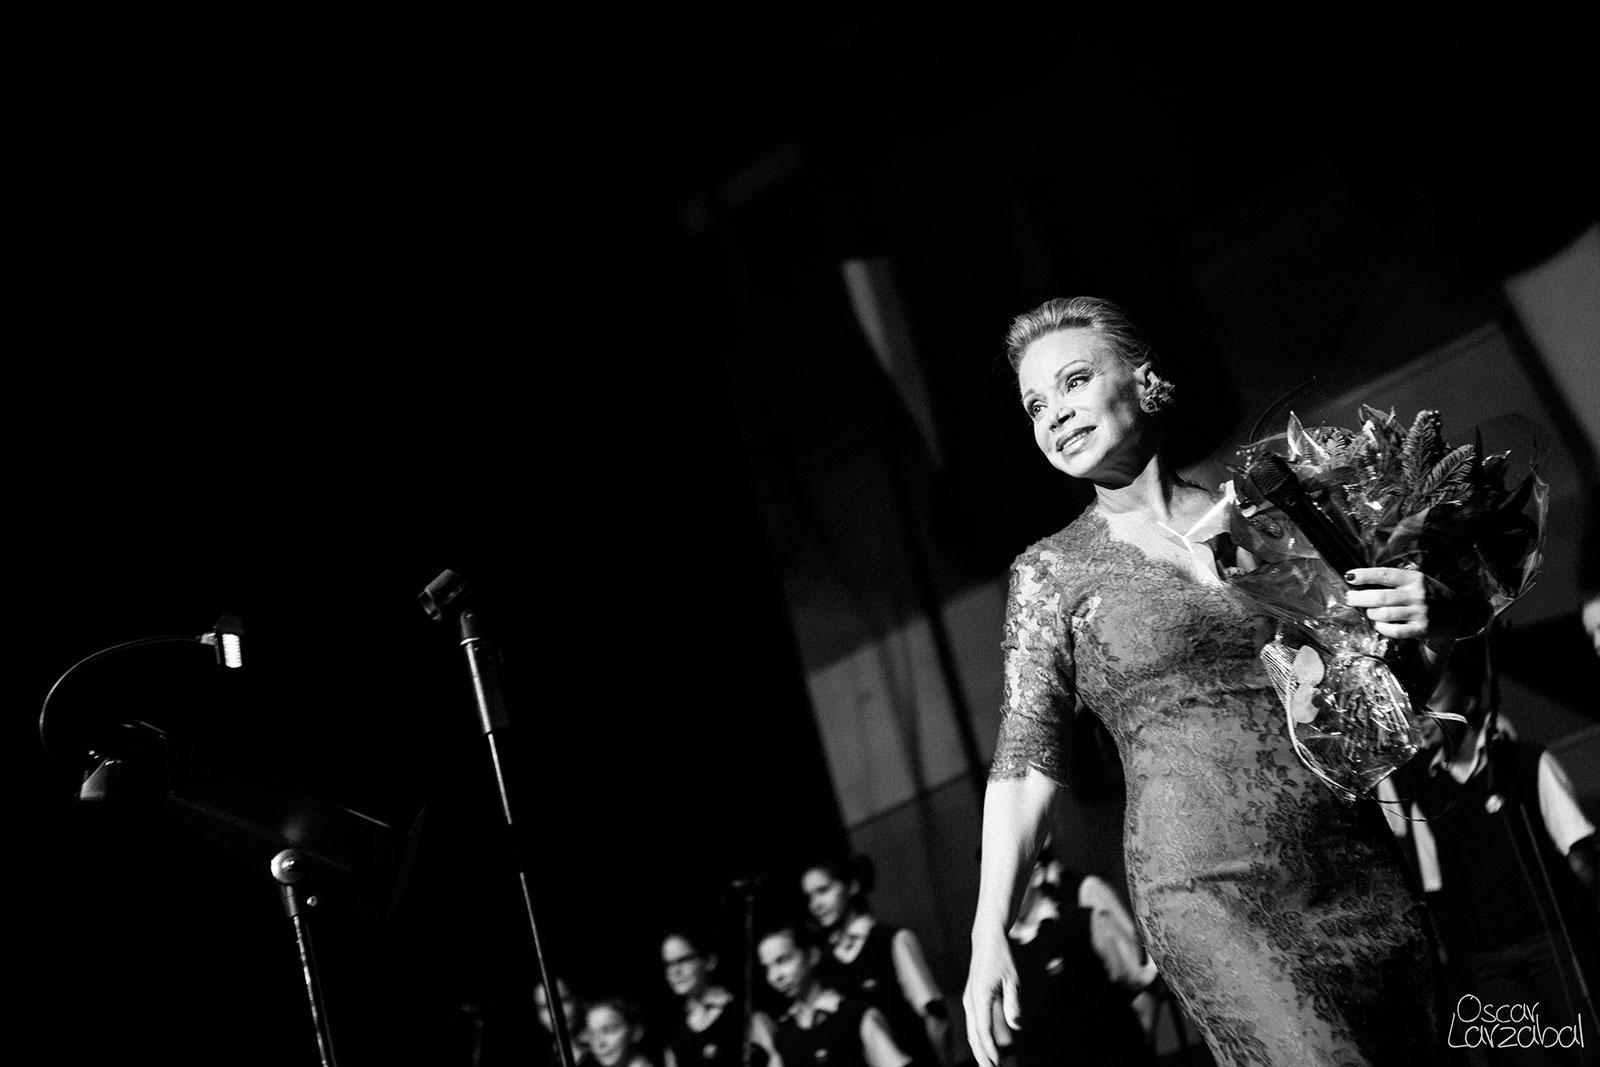 fotografo concierto Kursaal